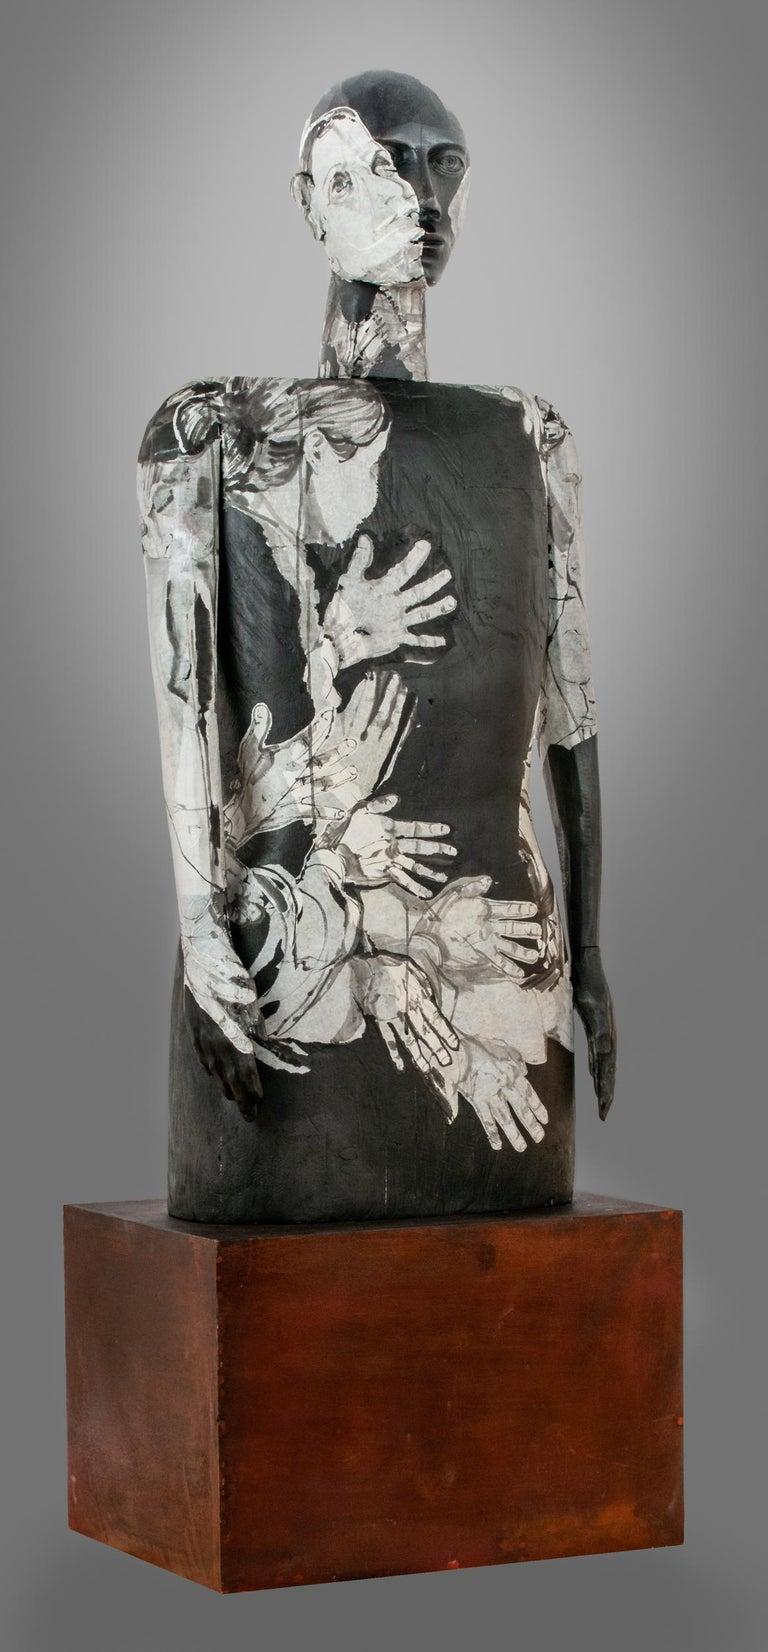 Joe Brubaker Figurative Sculpture - Sayujya